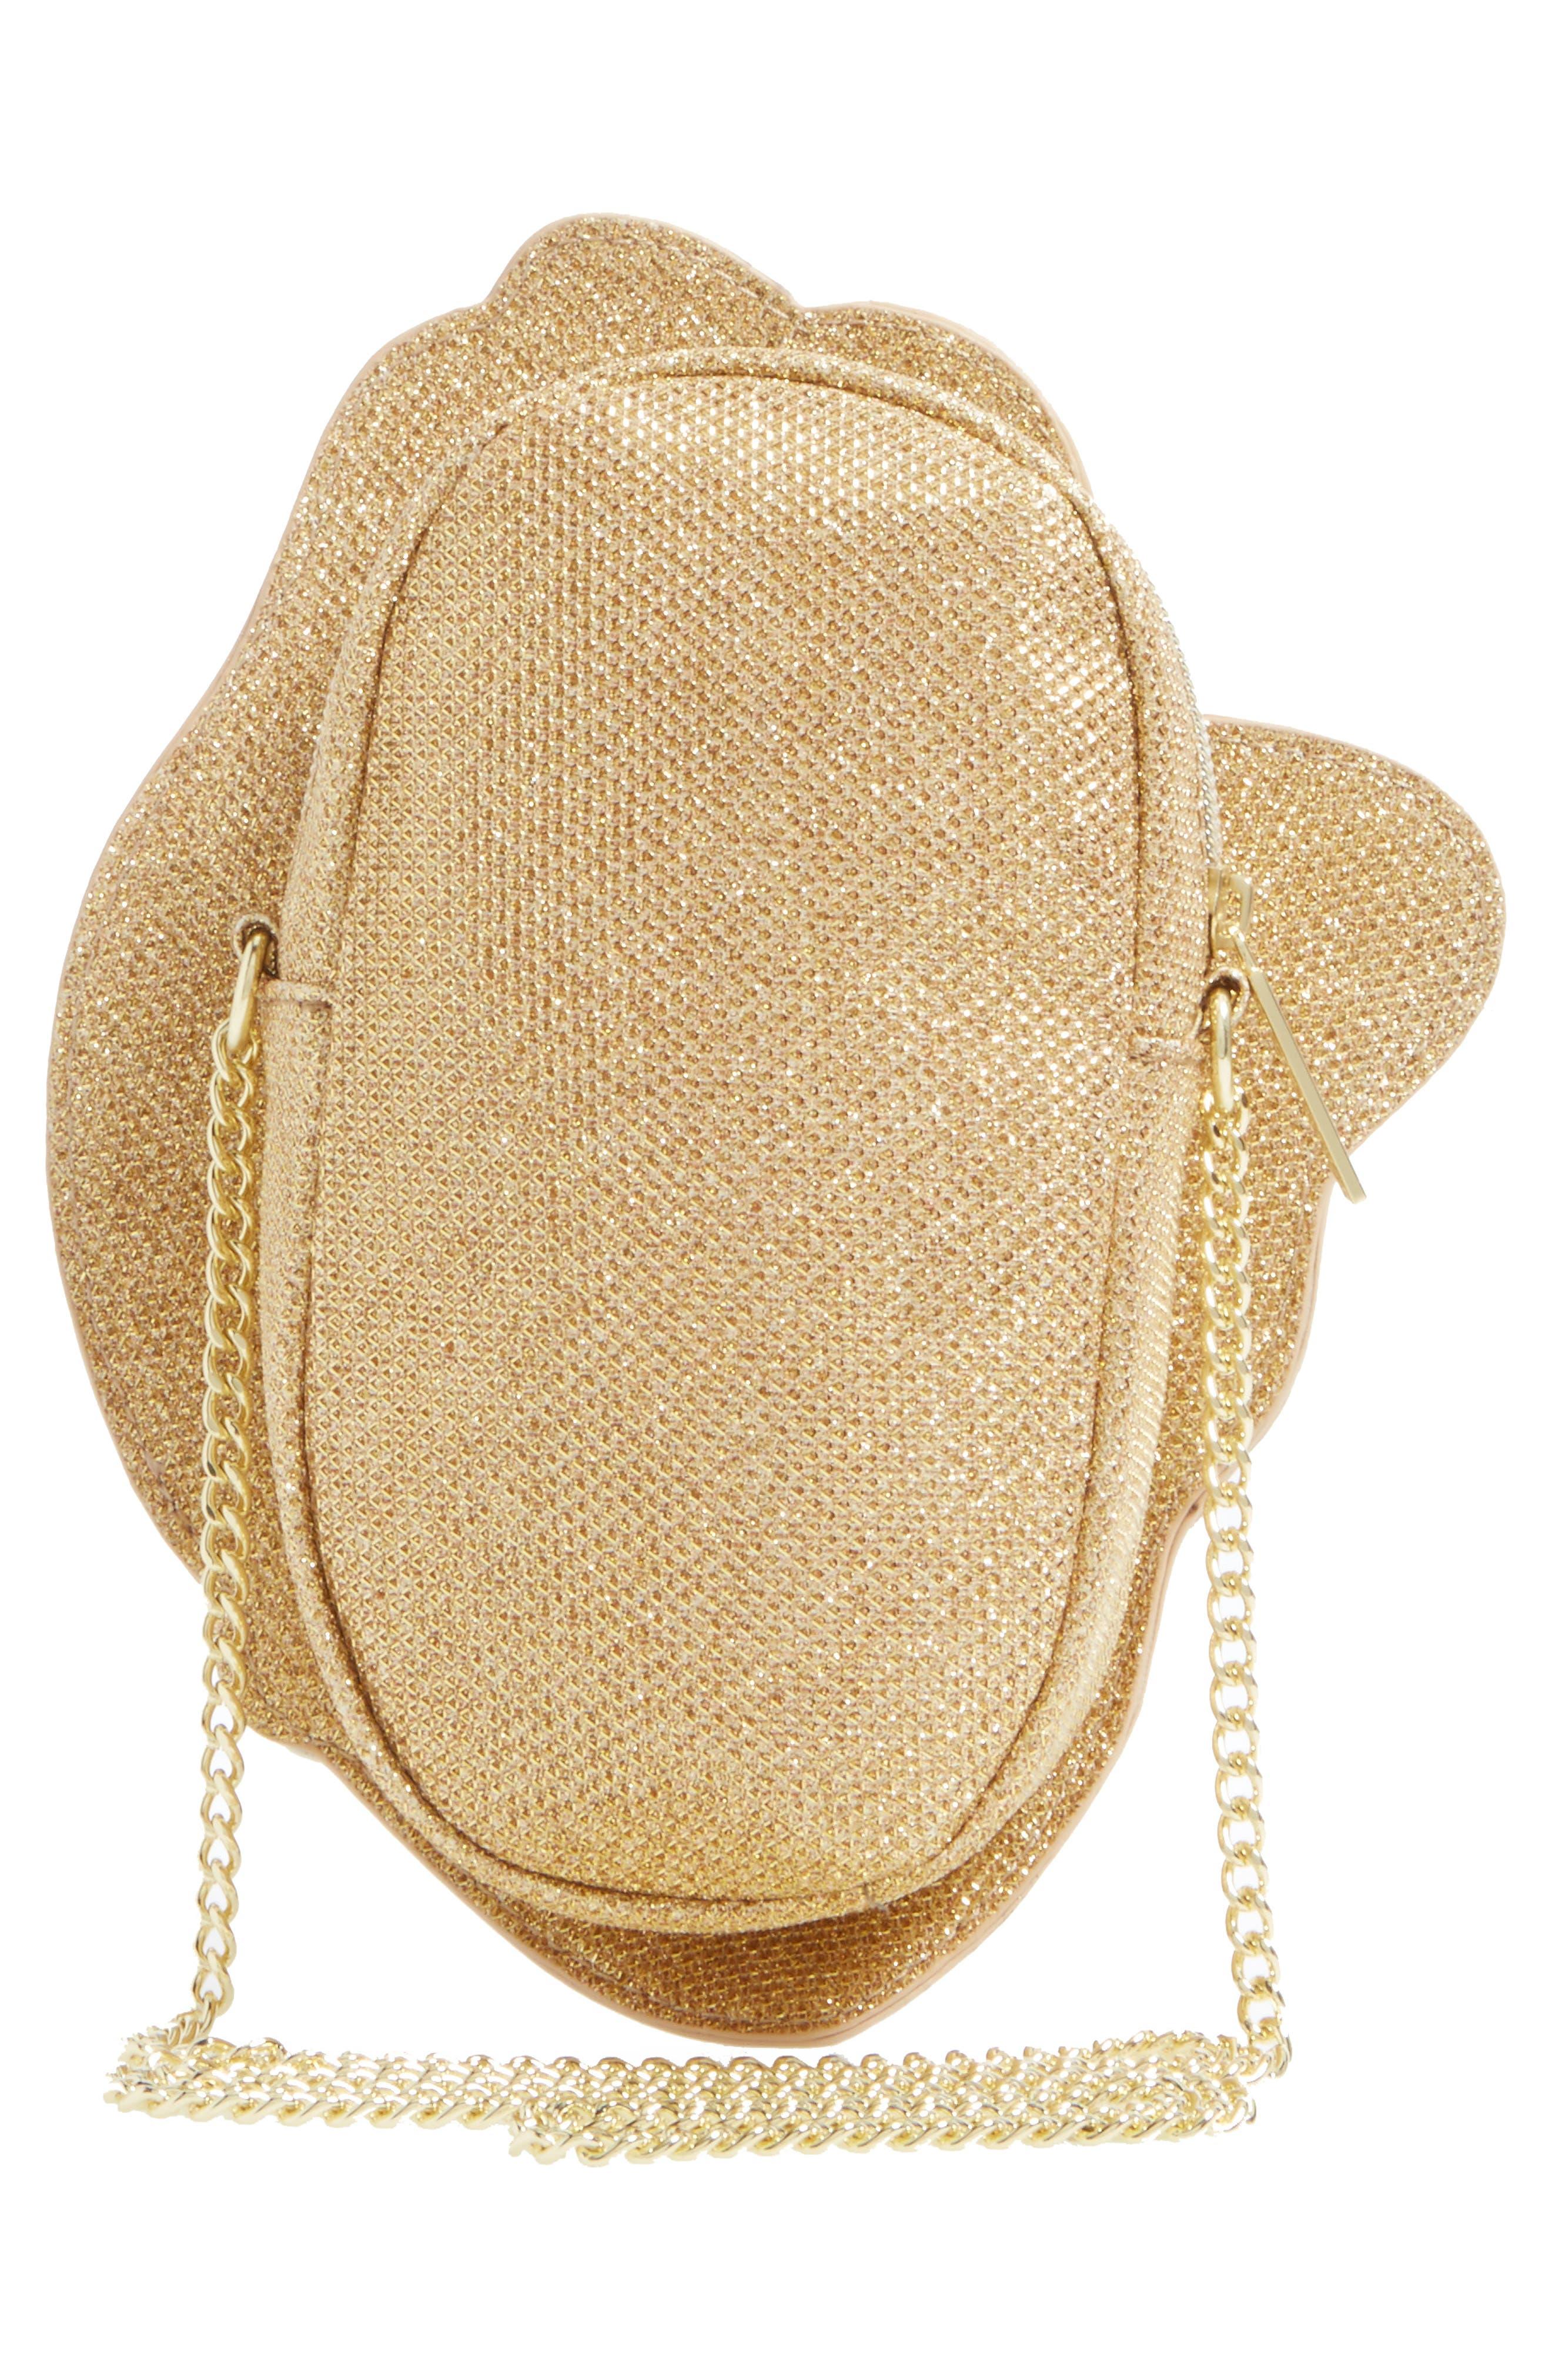 x Disney<sup>®</sup> Cinderella Crossbody Bag,                             Alternate thumbnail 2, color,                             Beige